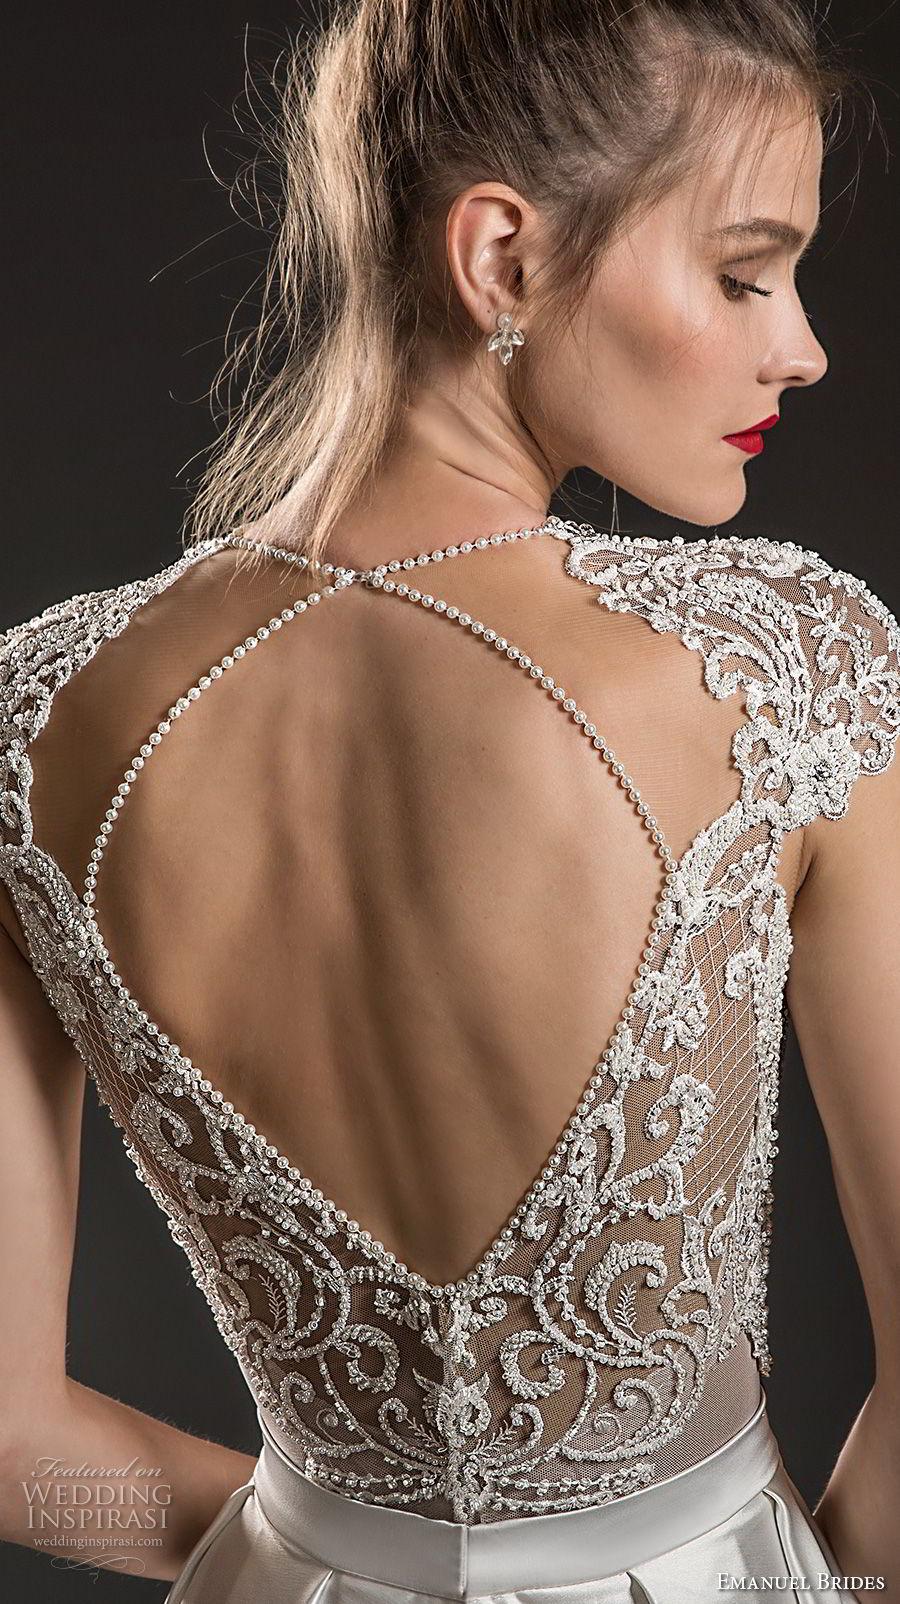 emanuel brides 2018 bridal cap sleeves deep v neck heavily embellished bodice sexy romantic soft a  line wedding dress keyhole back sweep train (12) zbv